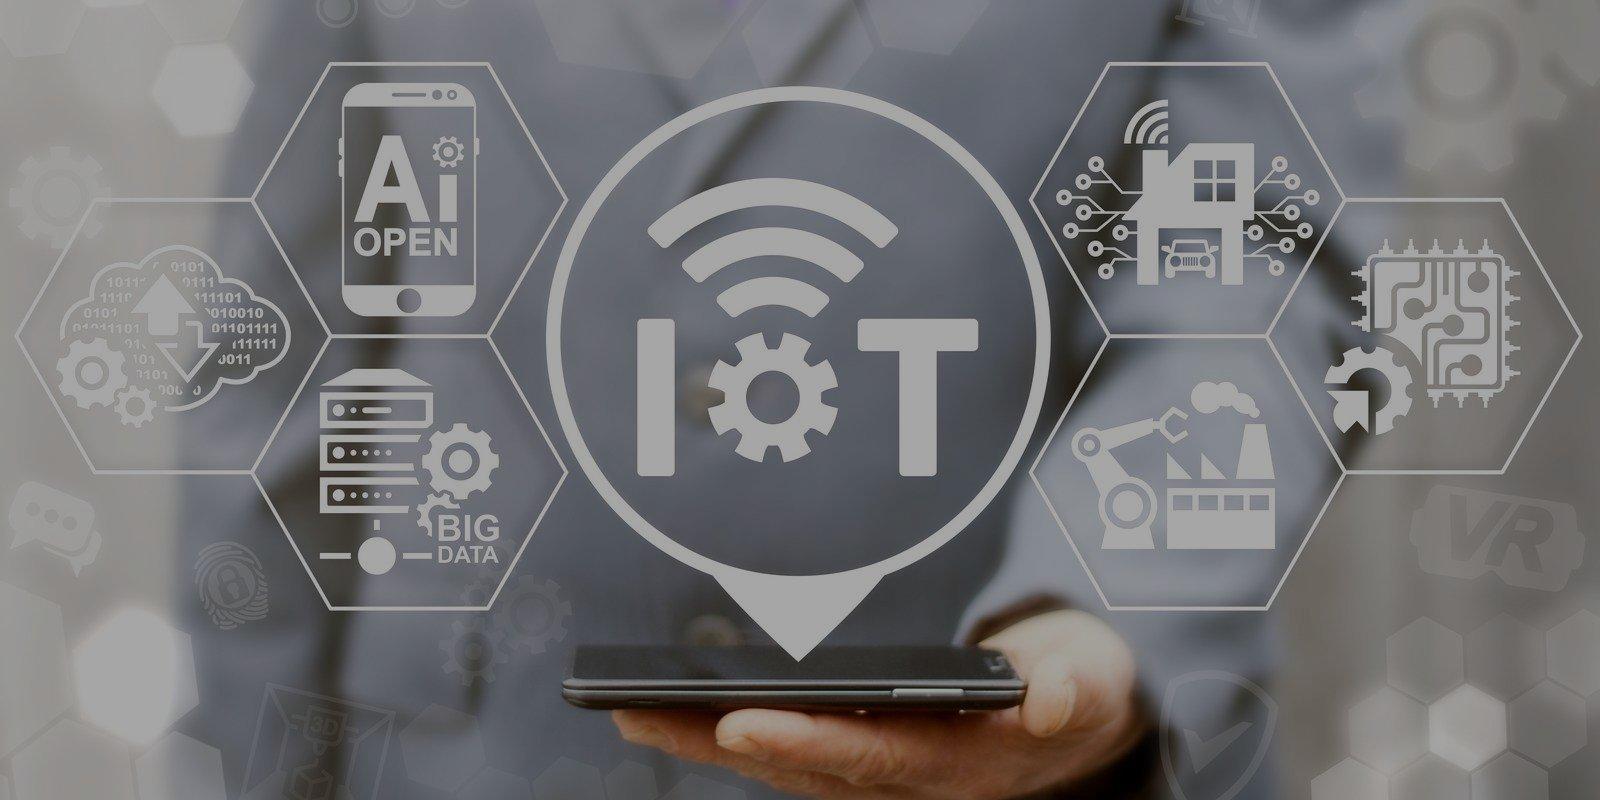 corsi industry 4.0 torino - Poliedra SPA